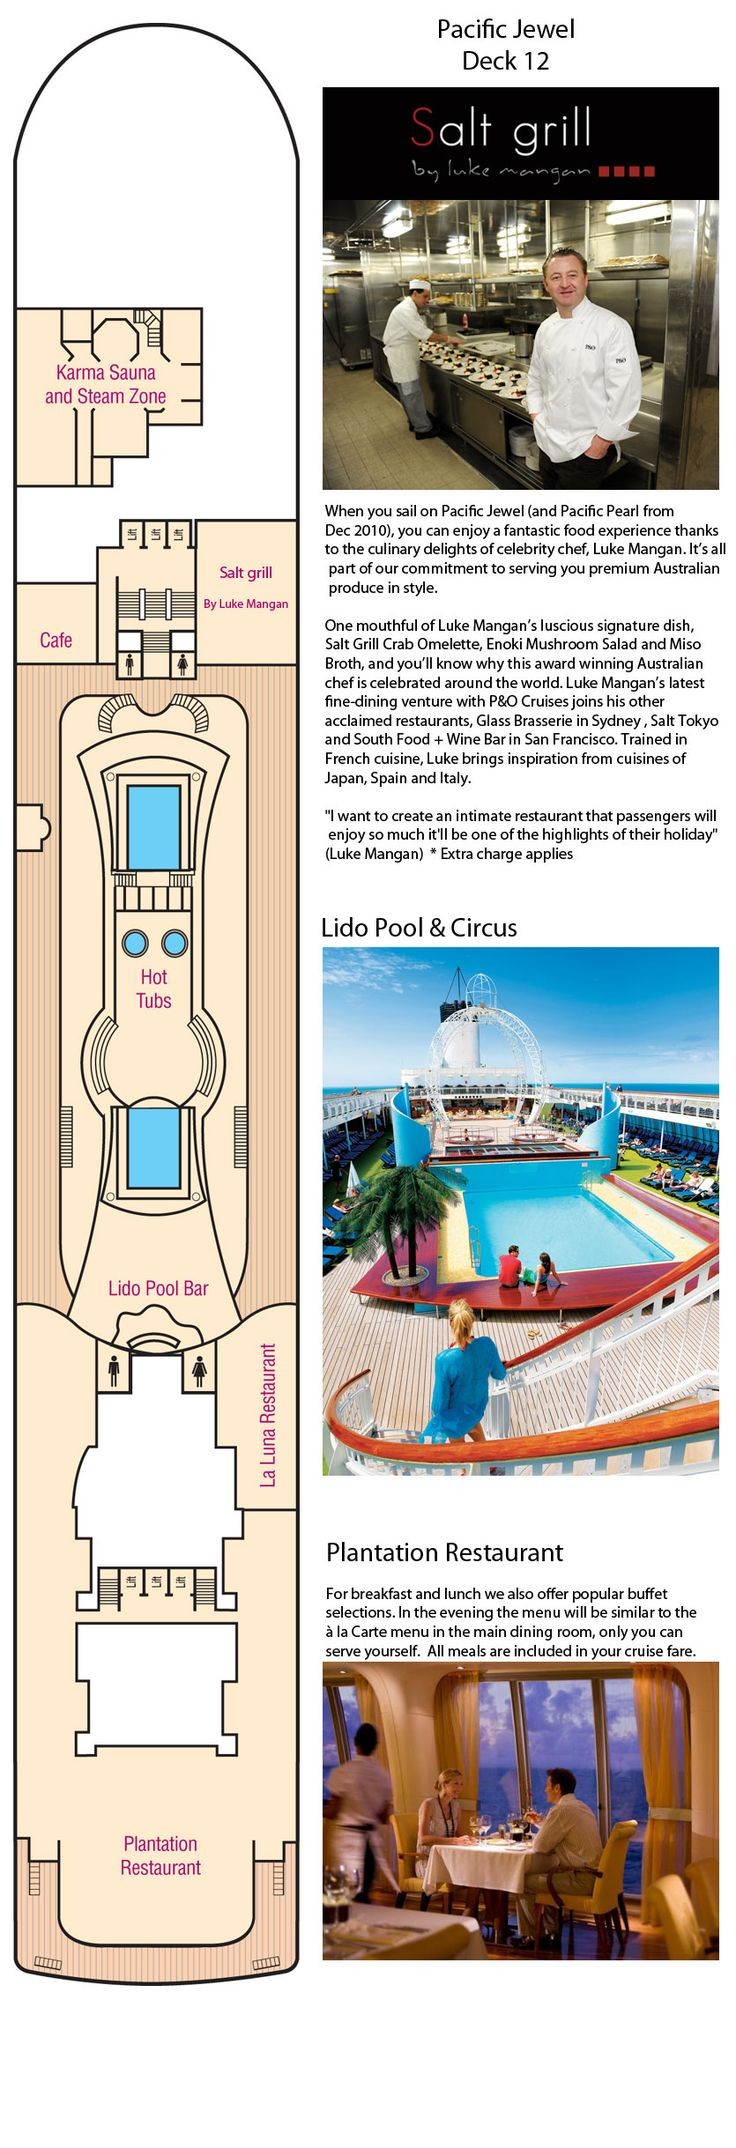 P&O Pacific Jewel: Deck 12